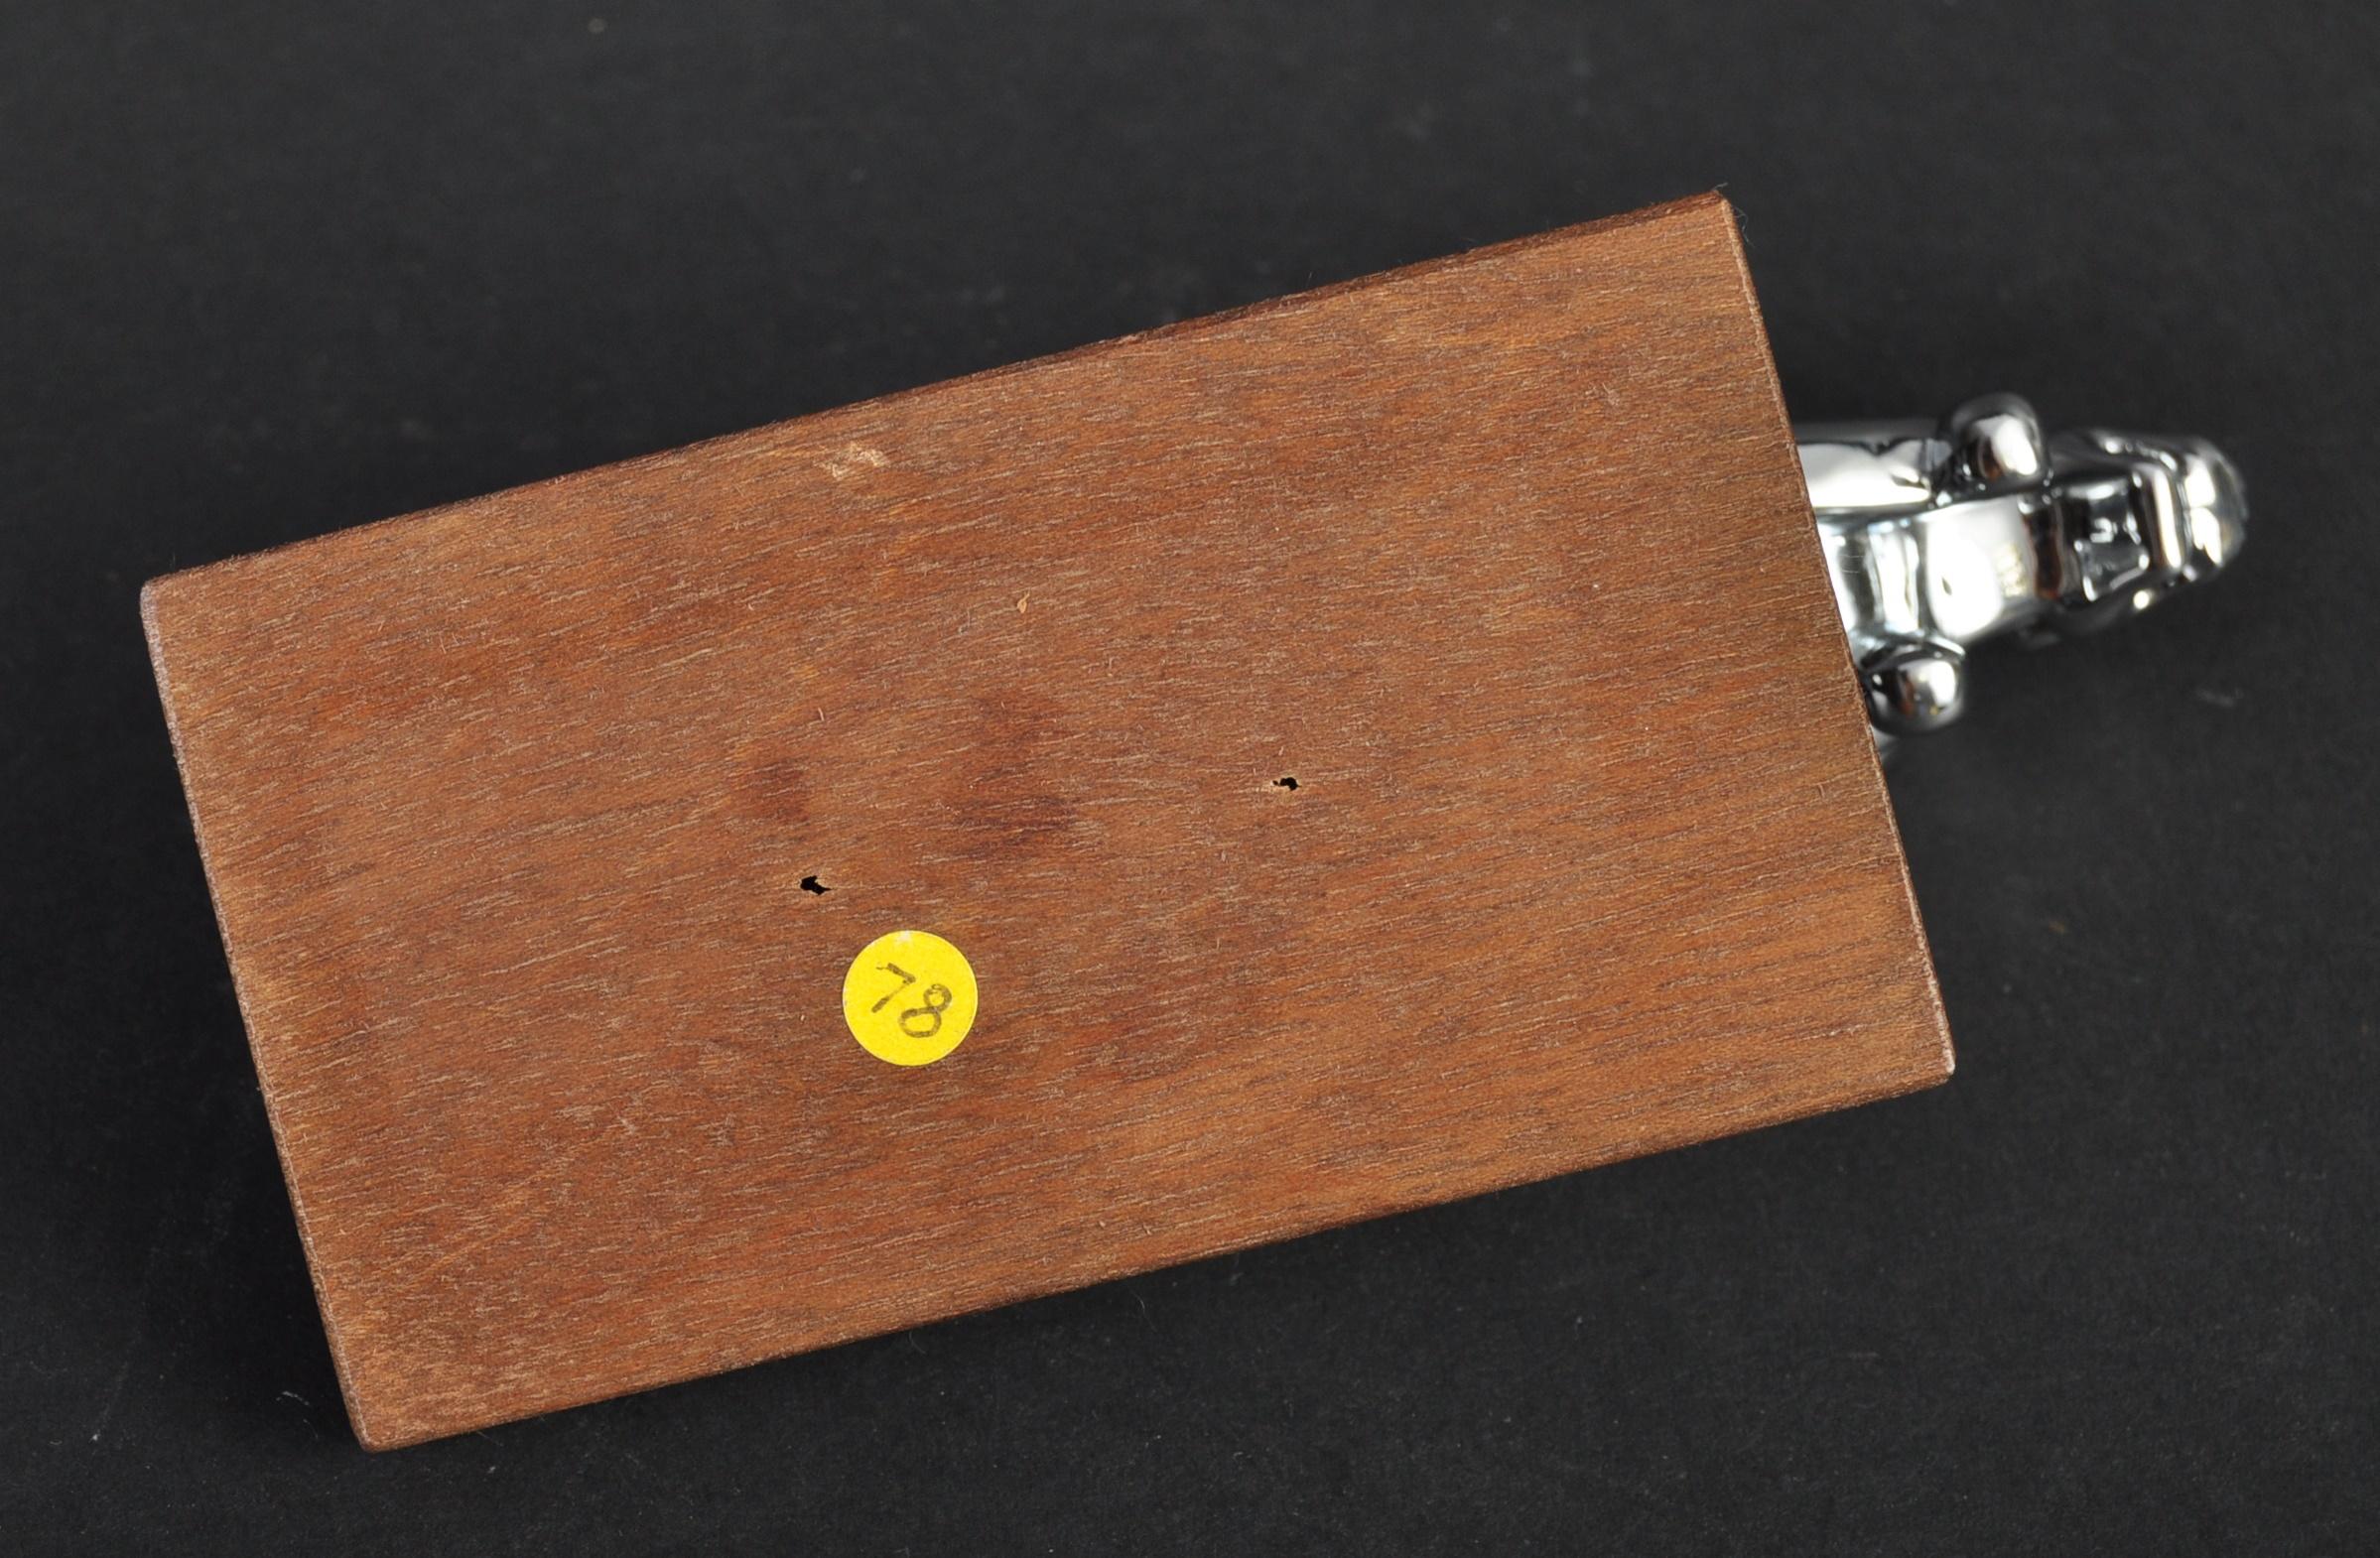 JAGUAR MASCOT - ORIGINAL SMALLER VERSION MADE FOR SCOOTERS - Image 5 of 5